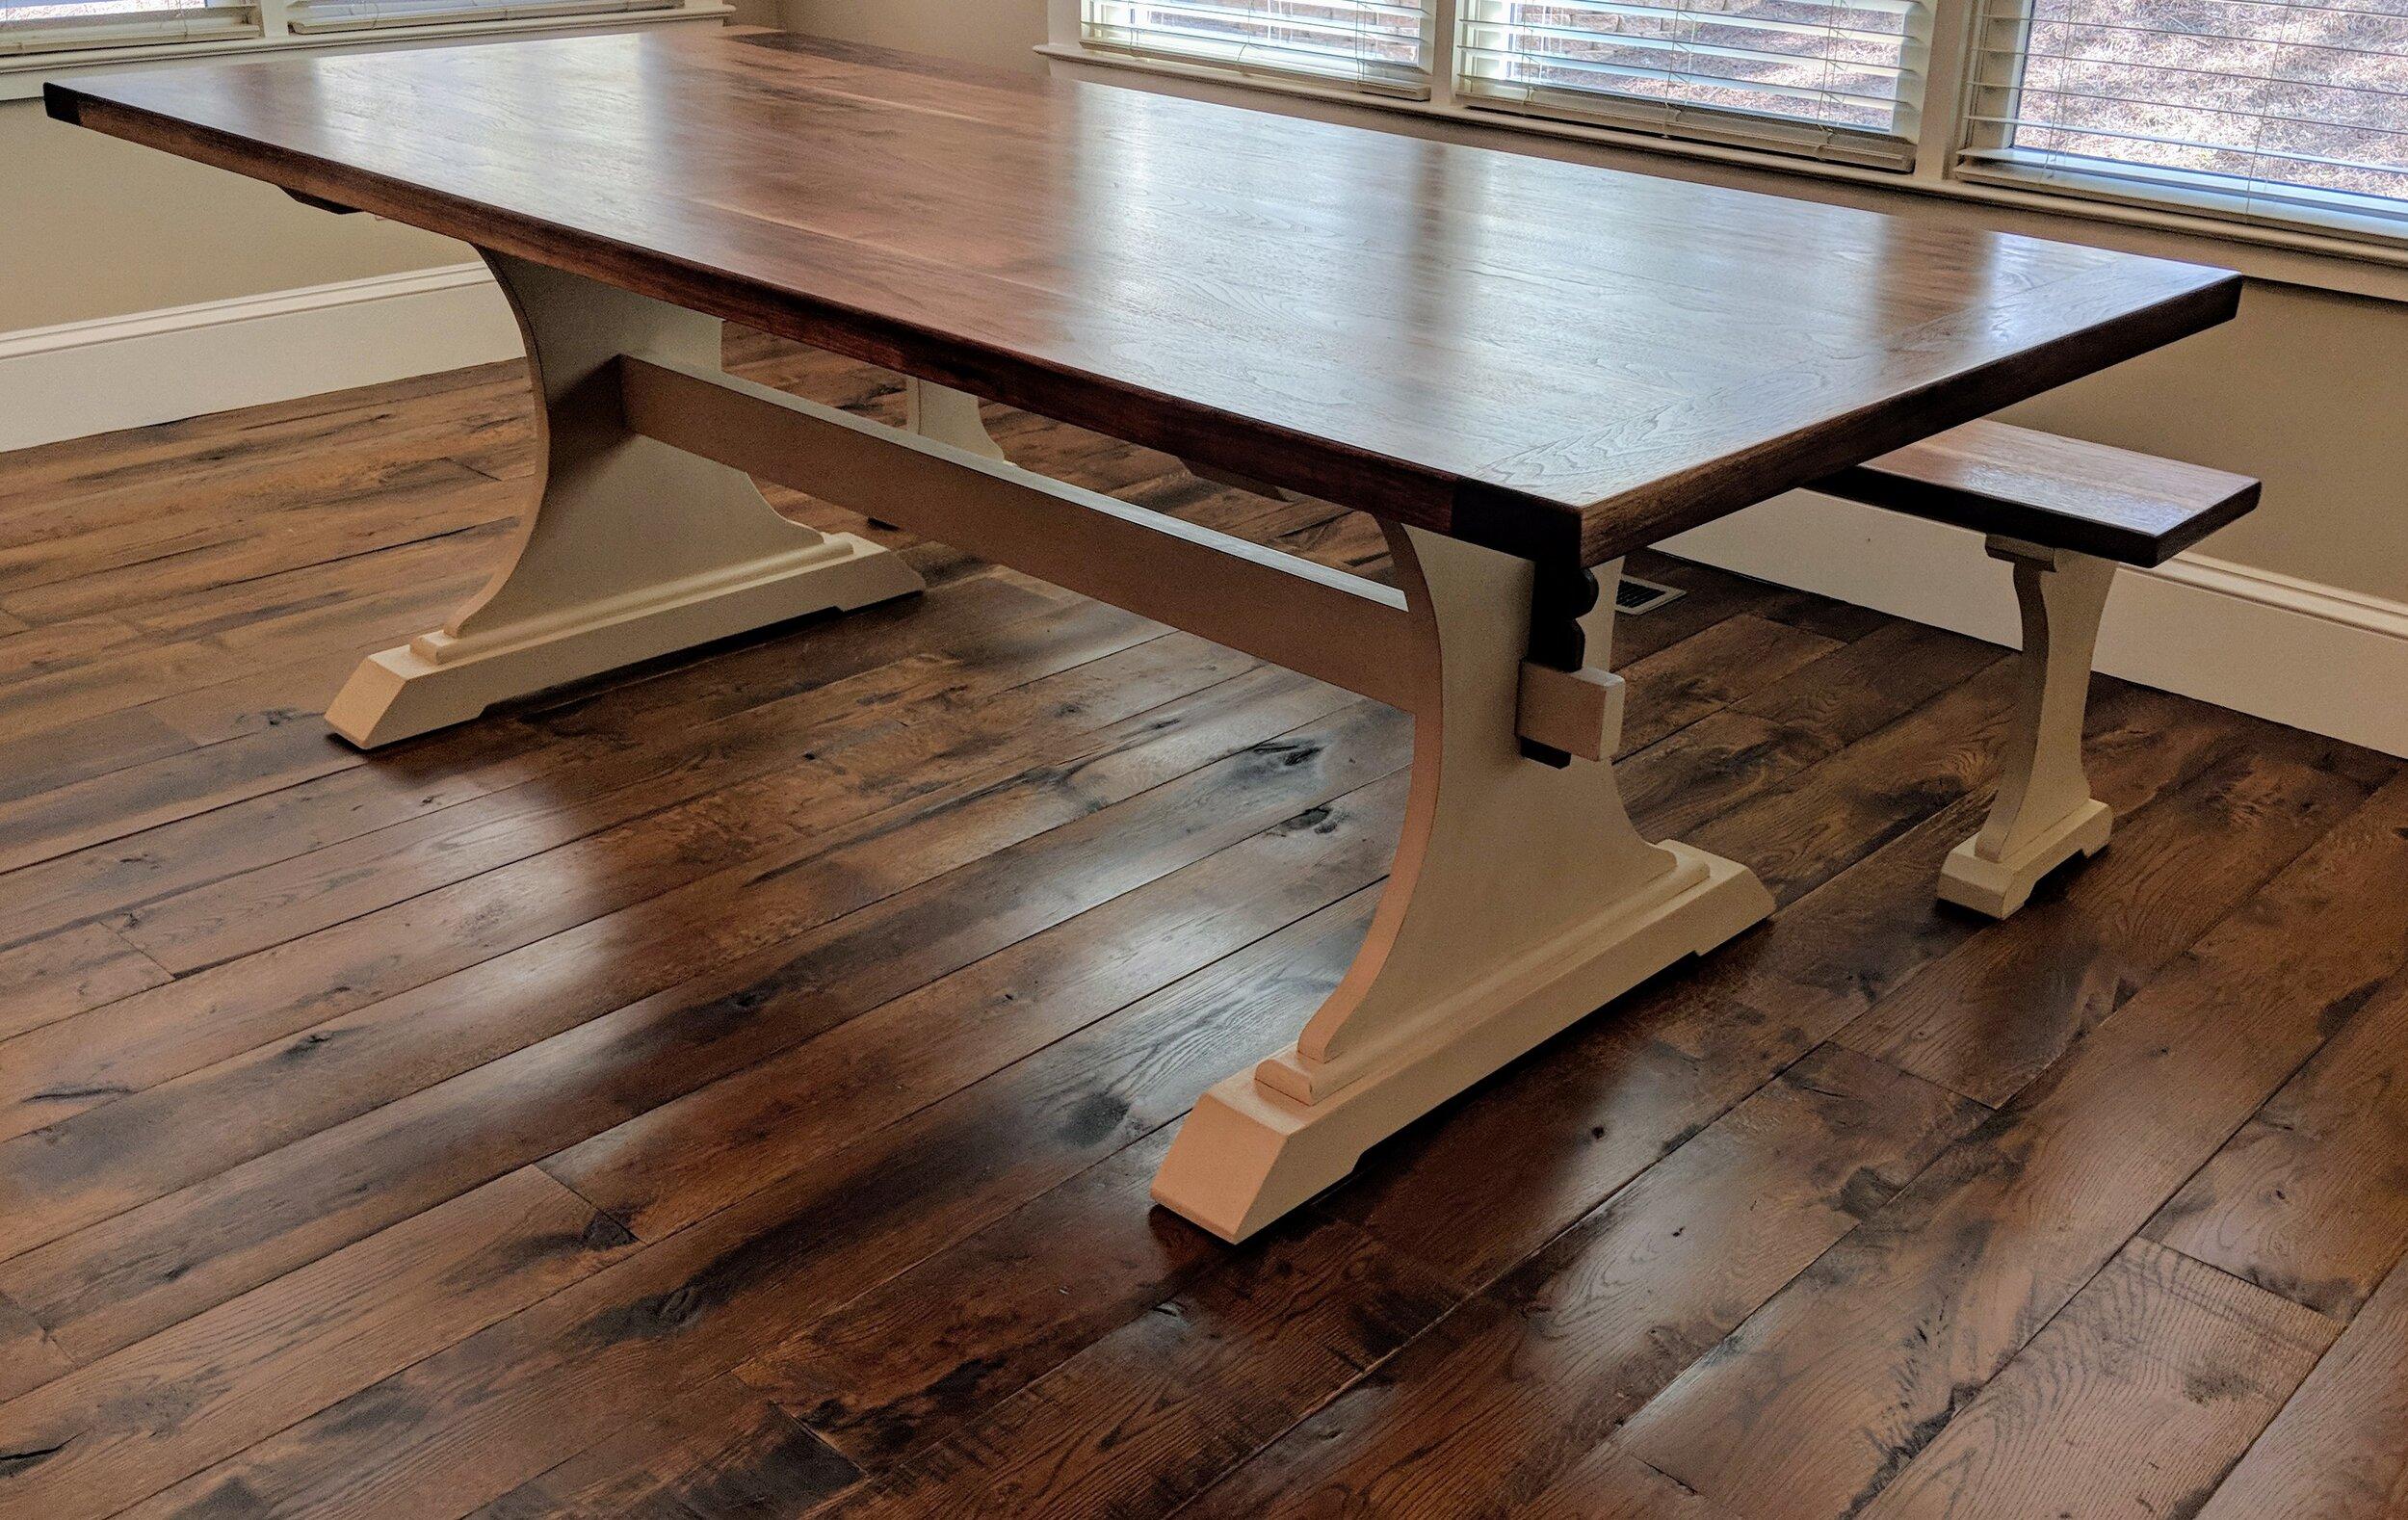 Building A Trestle Table Dining Vanvleet Woodworking